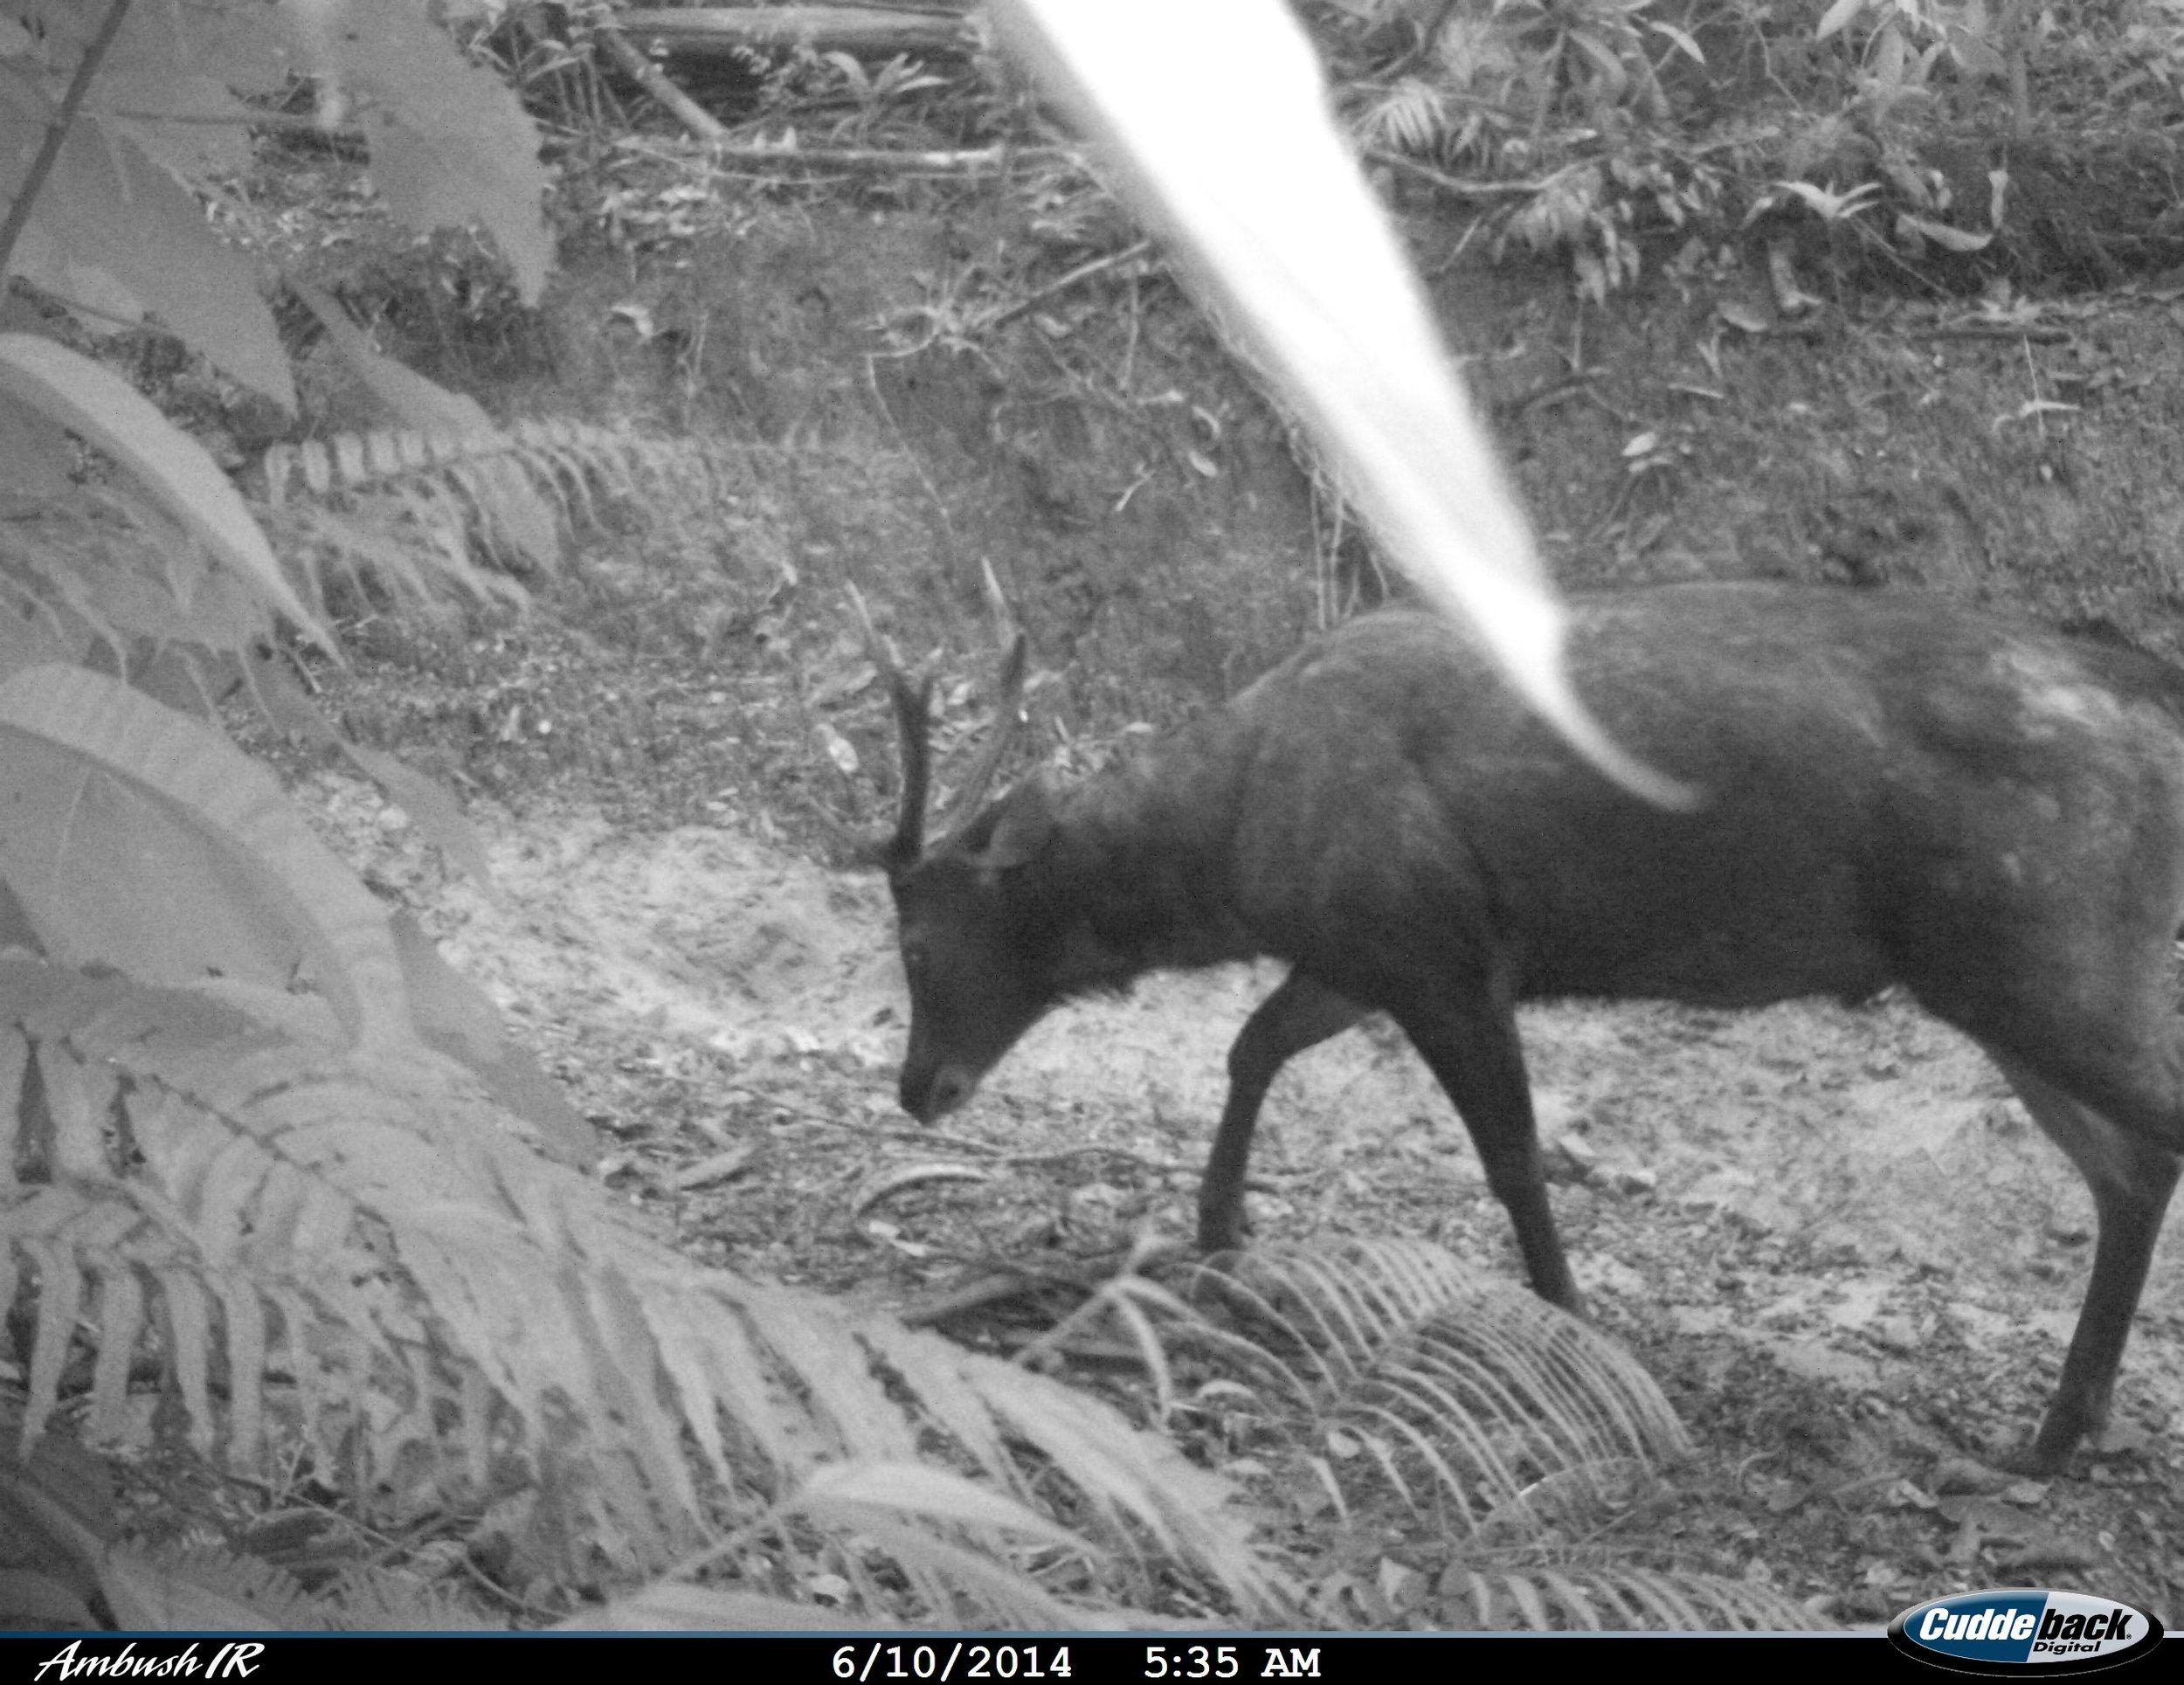 Sambar deer Belantikan (26)